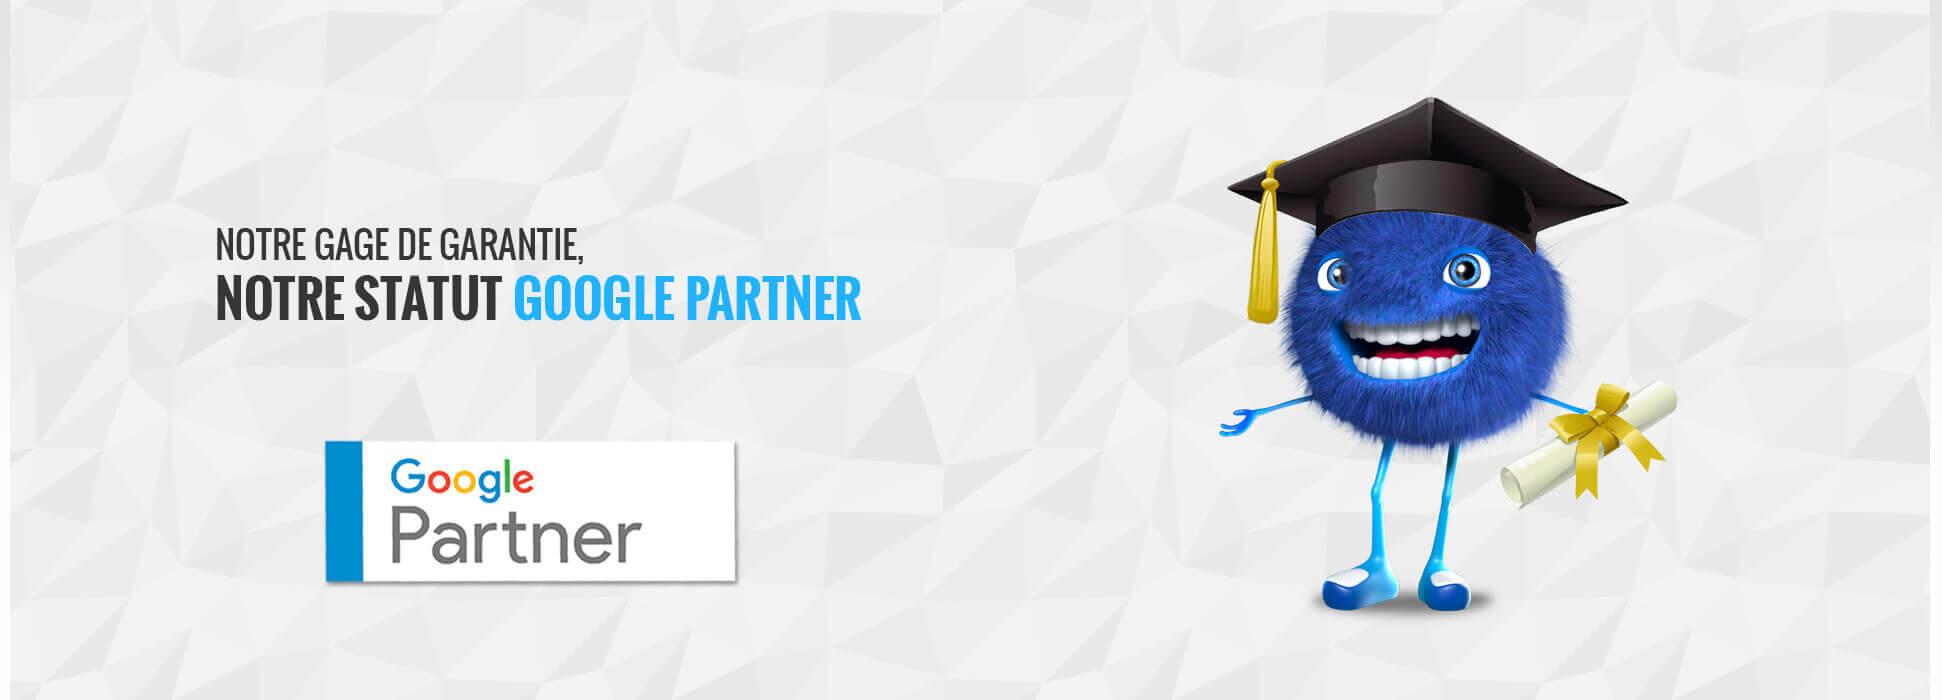 statut google partner neobiz